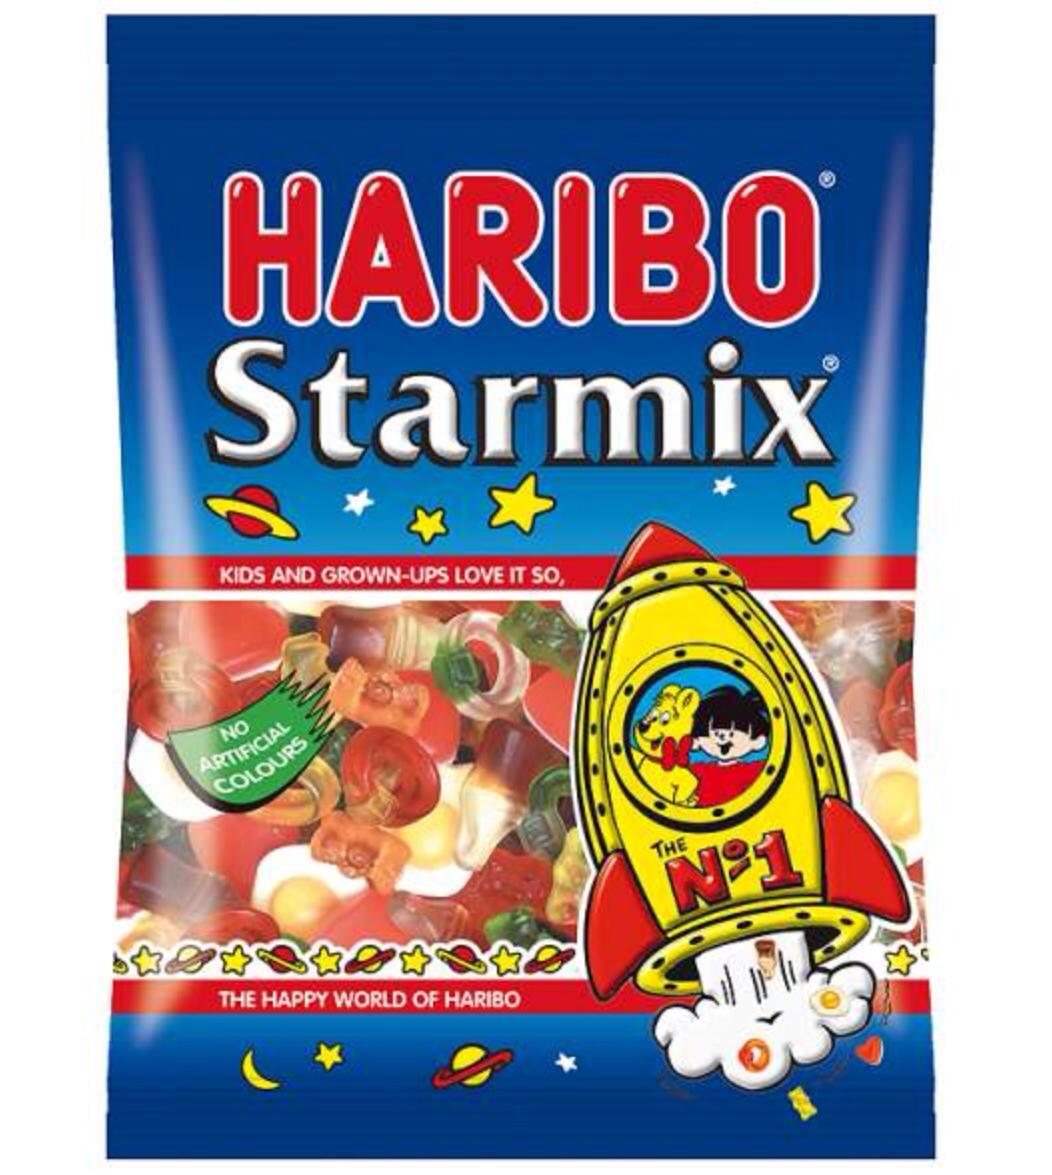 Haribo Starmix 160G Bag